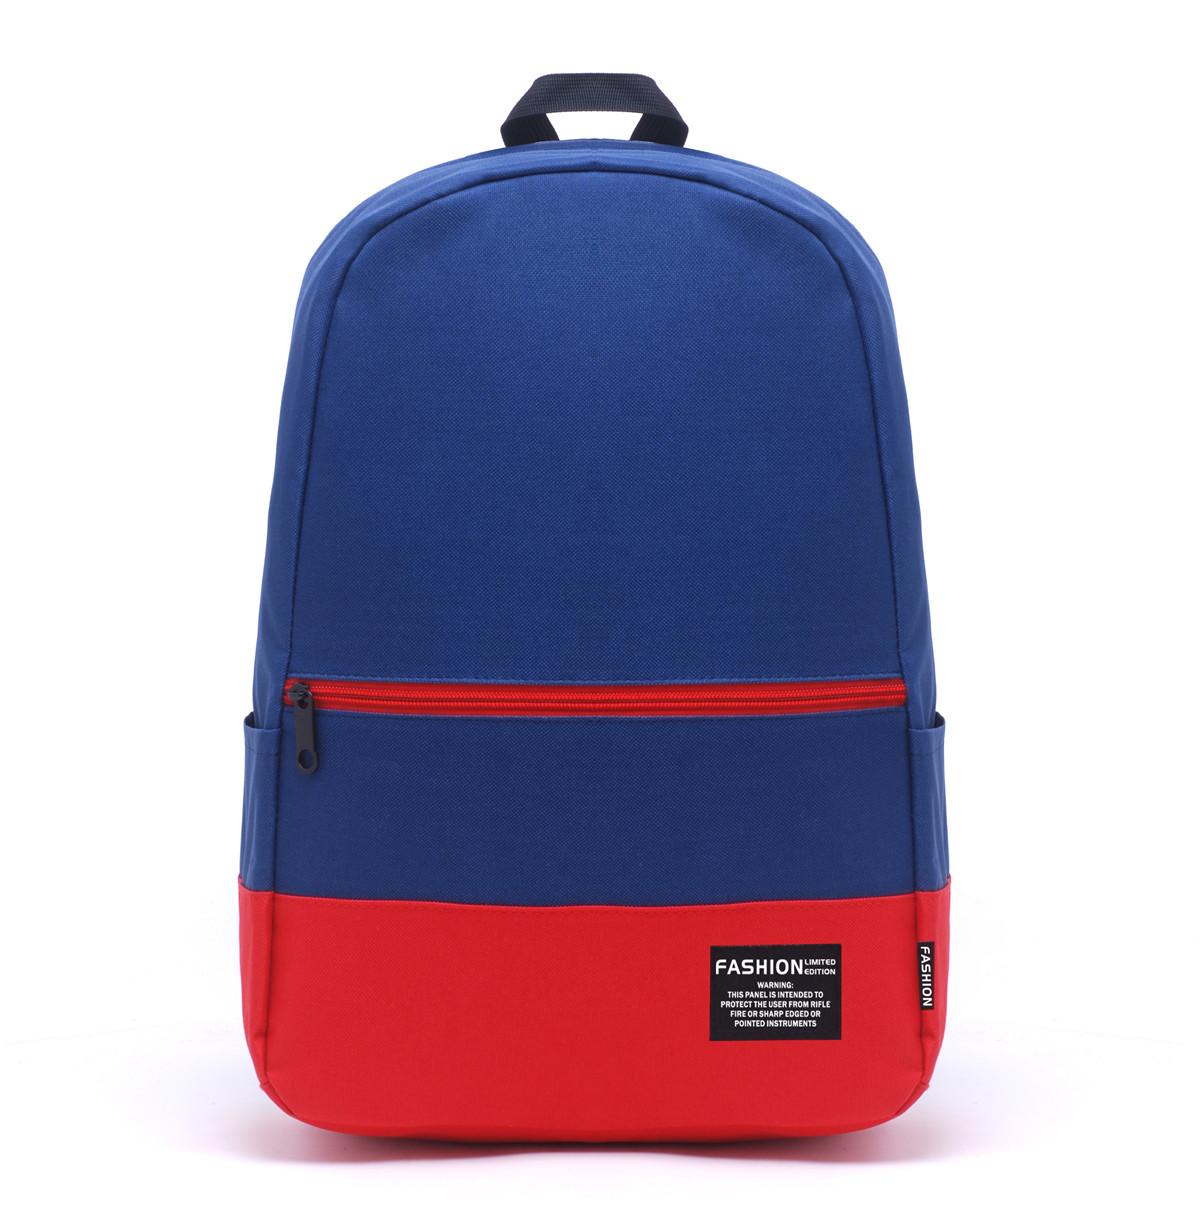 Brand new 2016 fashion women Back Pack girls Canvas Backpack Polka Path School Shoulder Bag Travel Rucksacks Mochilas(China (Mainland))